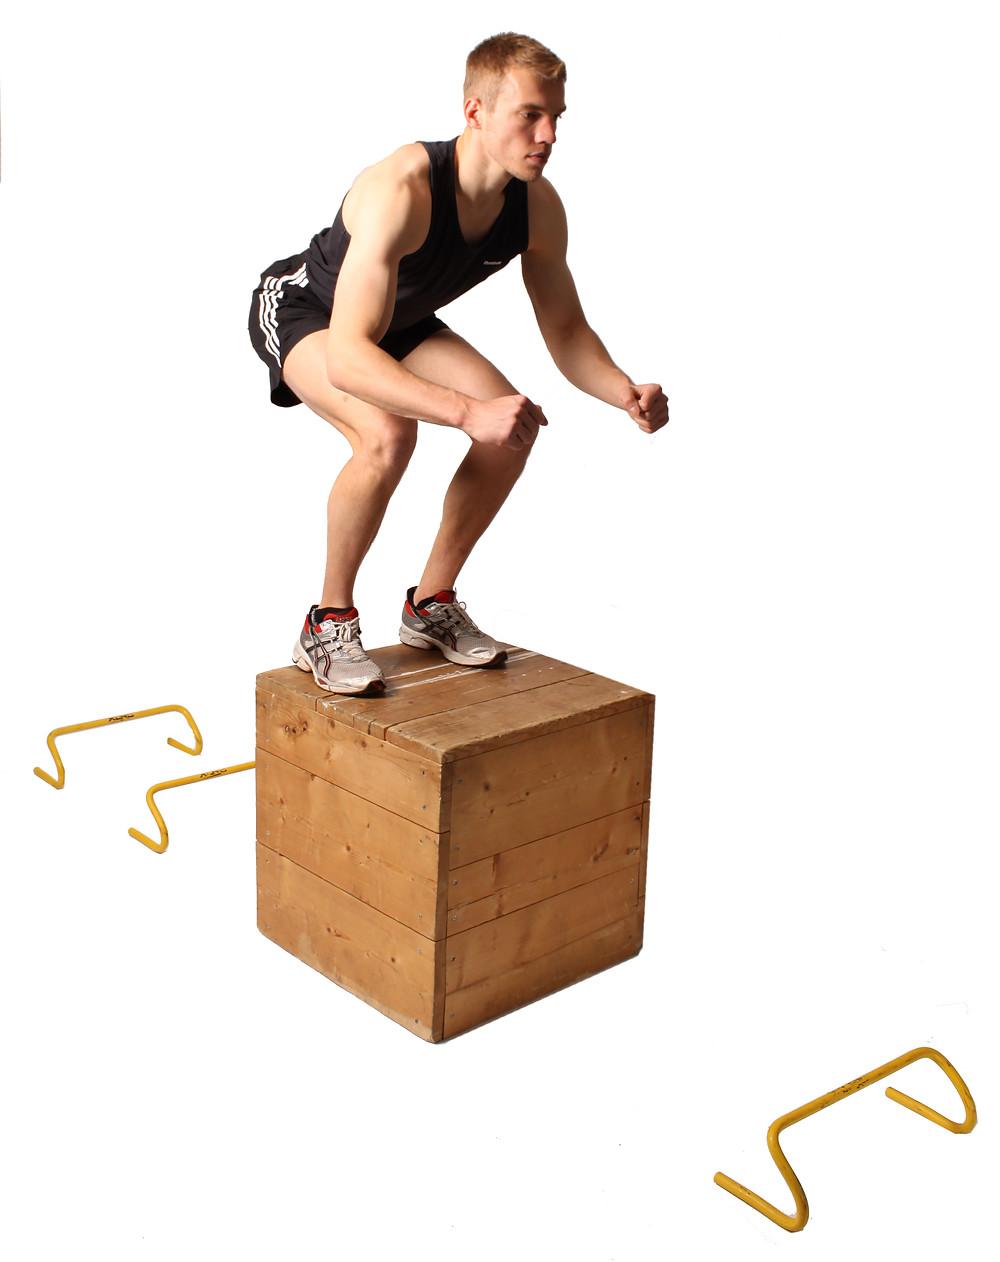 a man performing a plyometric double foot jump onto a plyometric box.